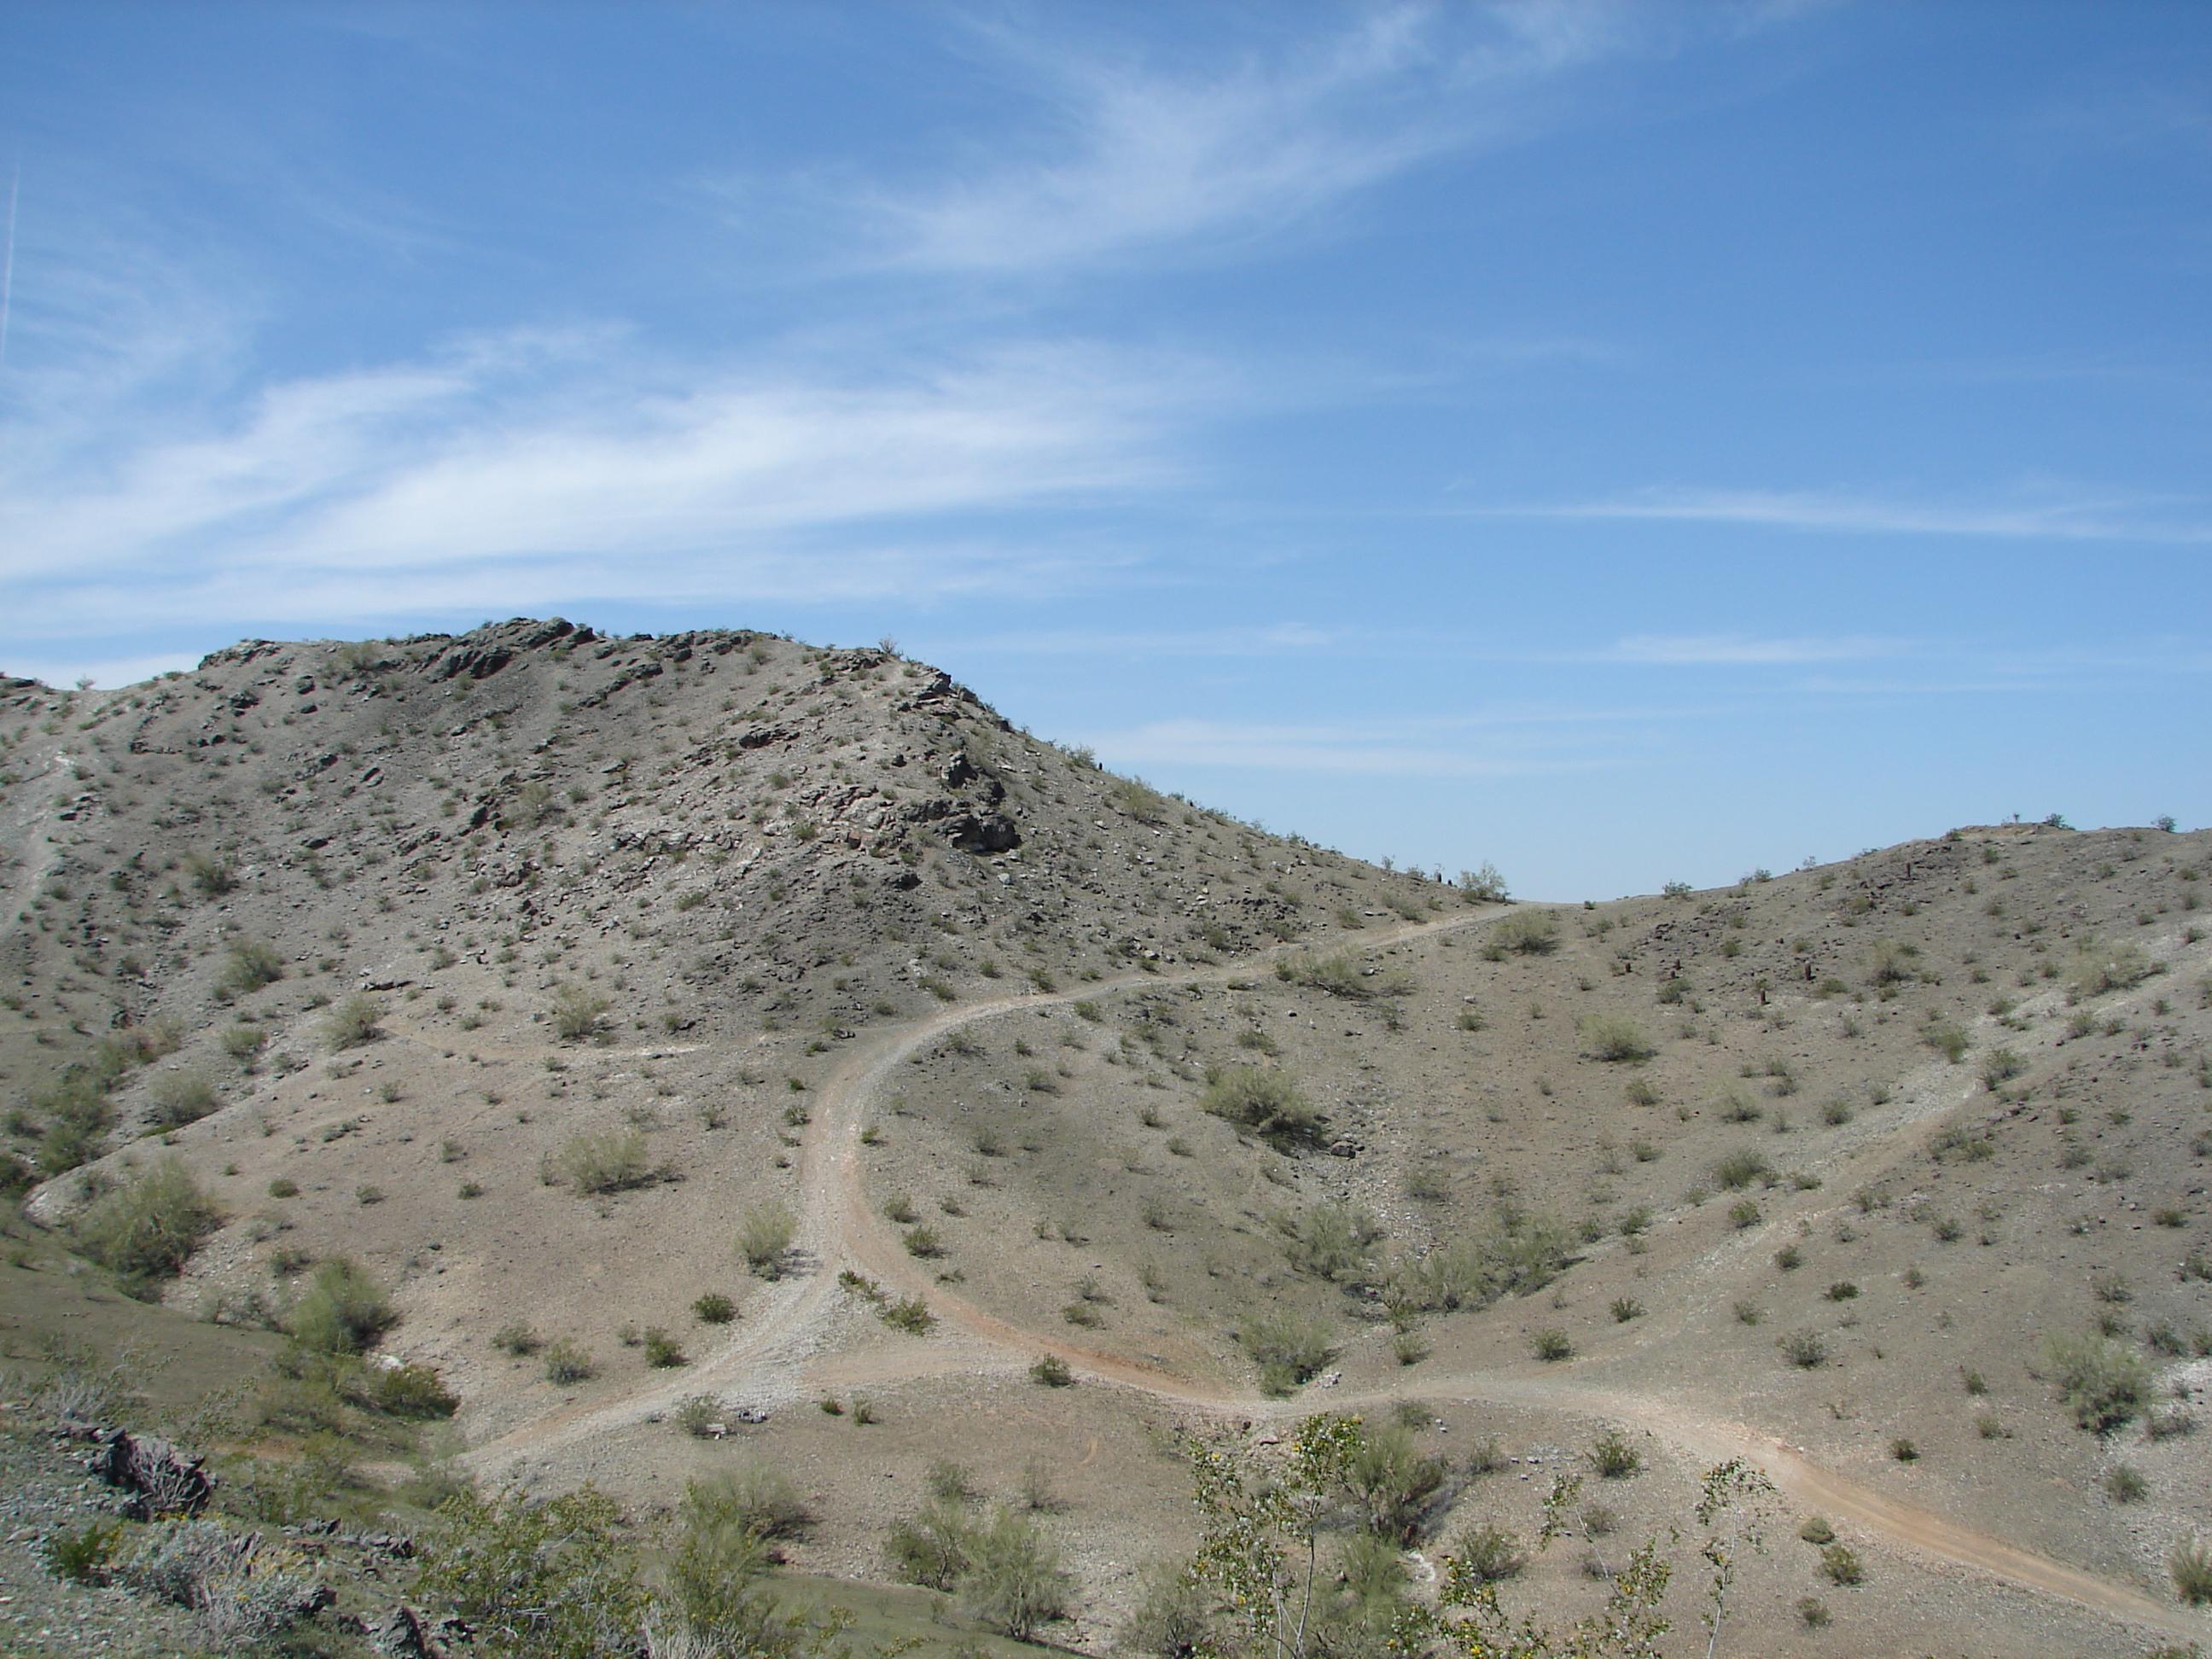 Phoenix laveen dating 85339